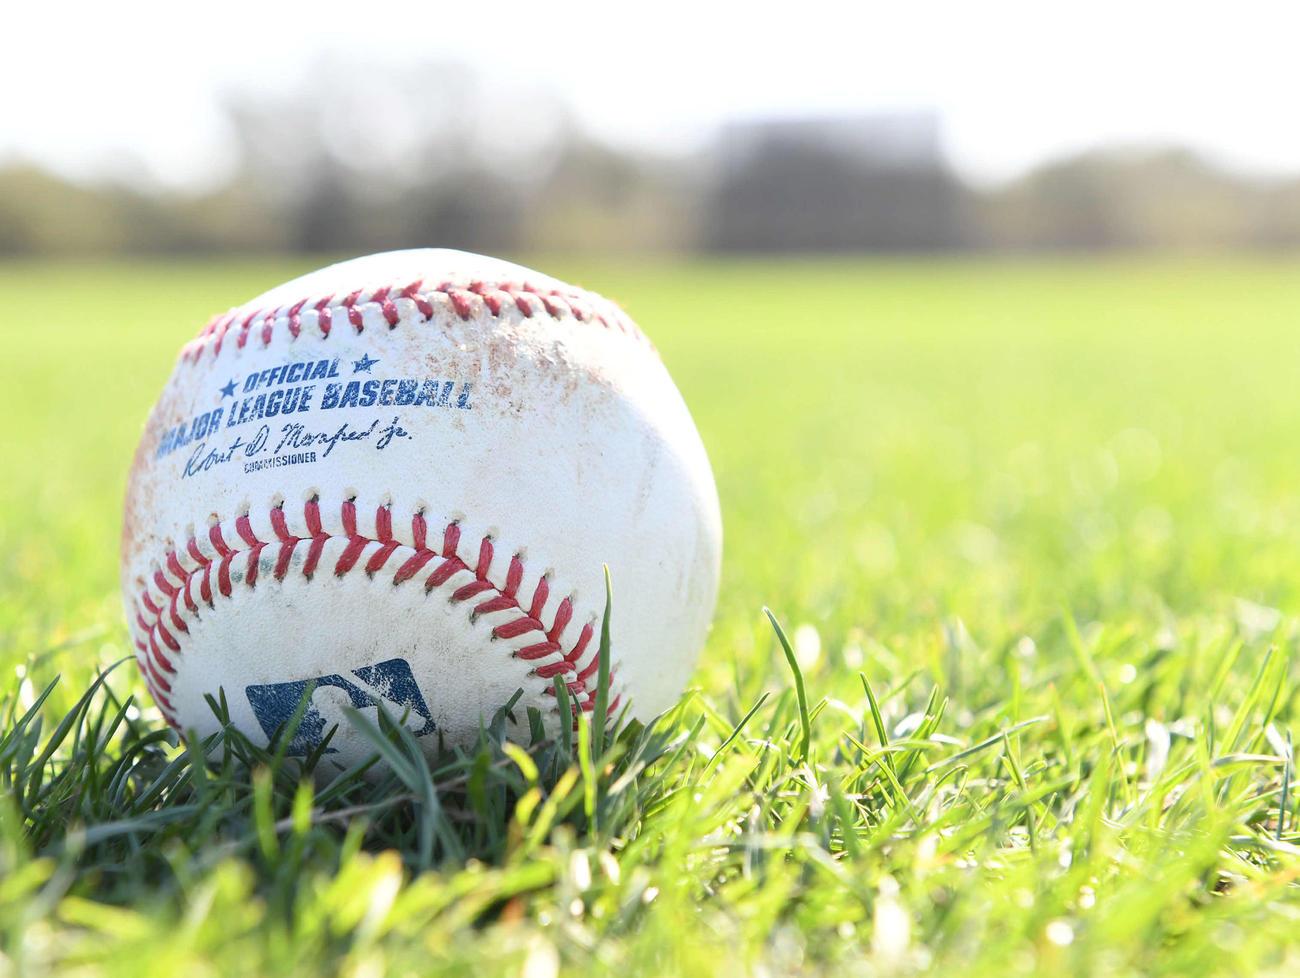 MLB(大リーグ)の公式球(2020年2月22日撮影)